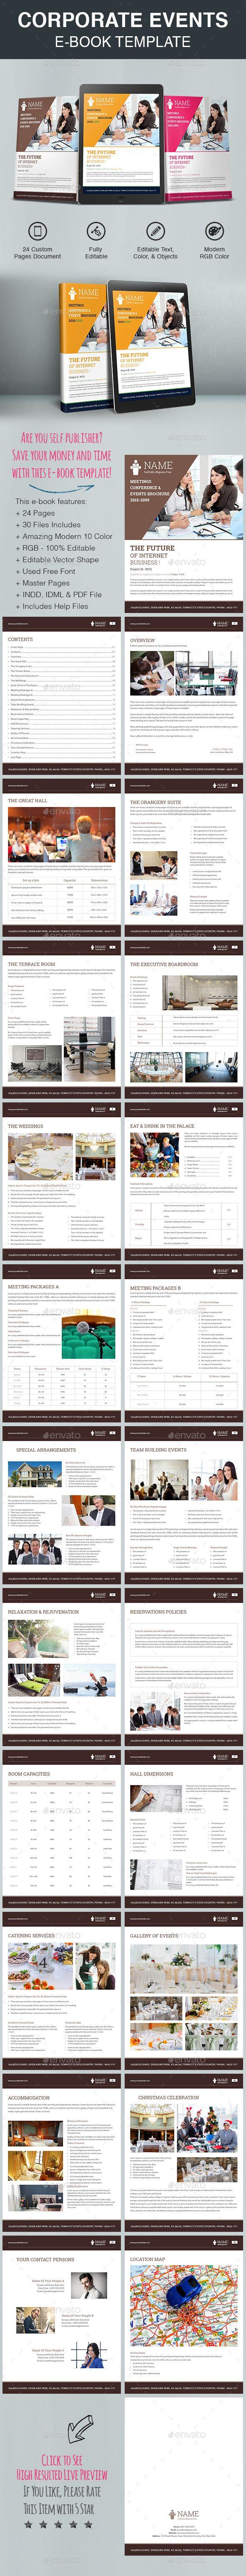 Corporate Events E-Book Template